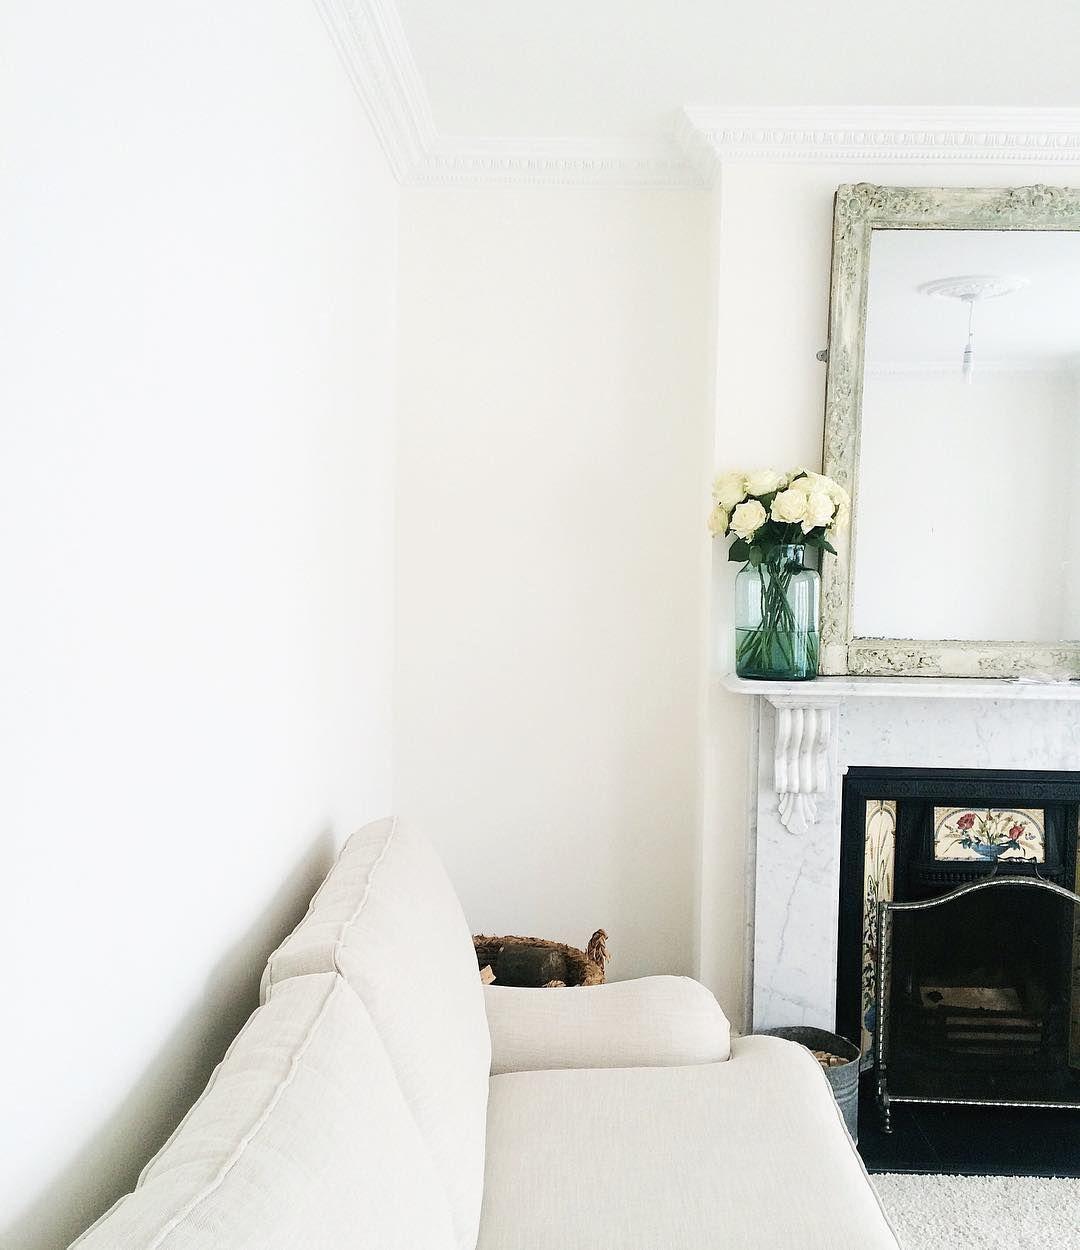 Dulux Jasmine White Walls Living Room Paint Dulux White Paint Room Wall Colors Jasmine white bedroom ideas